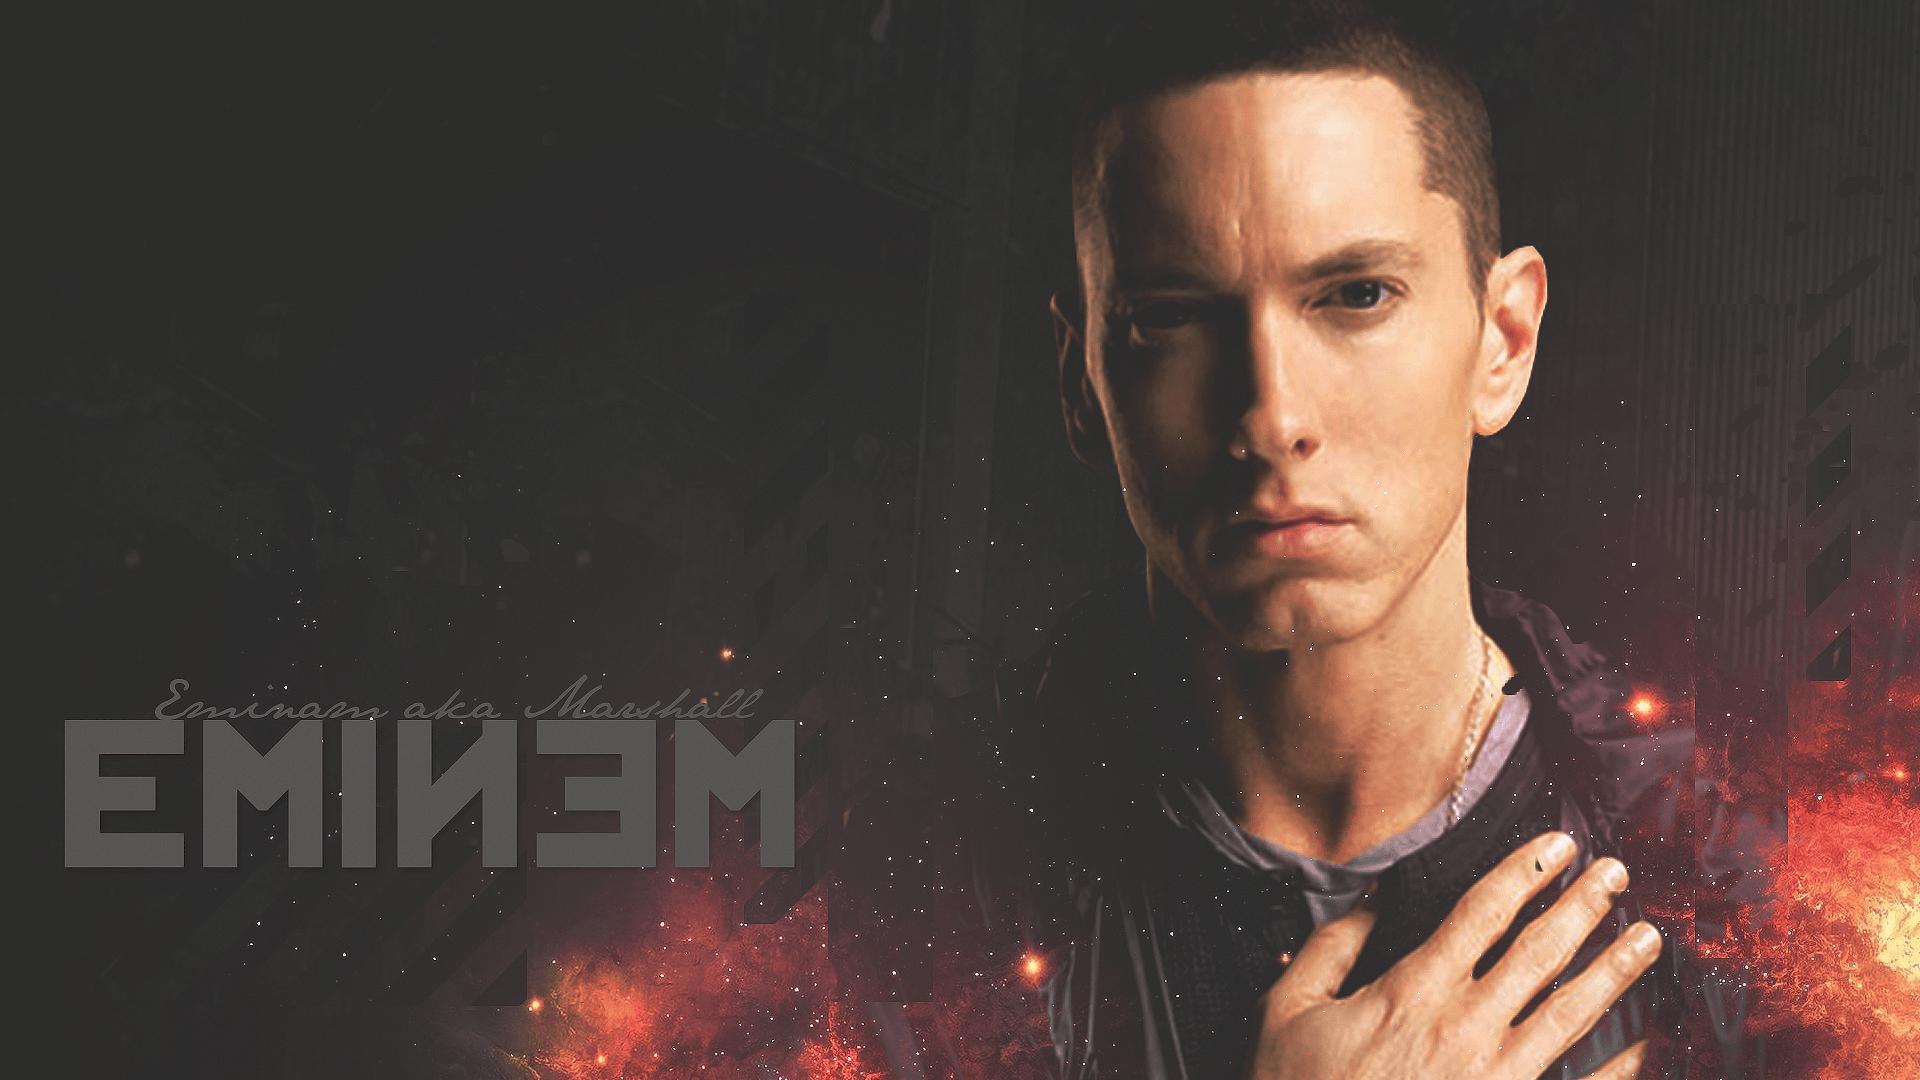 Eminem Wallpapers Hd 2017 Wallpaper Cave